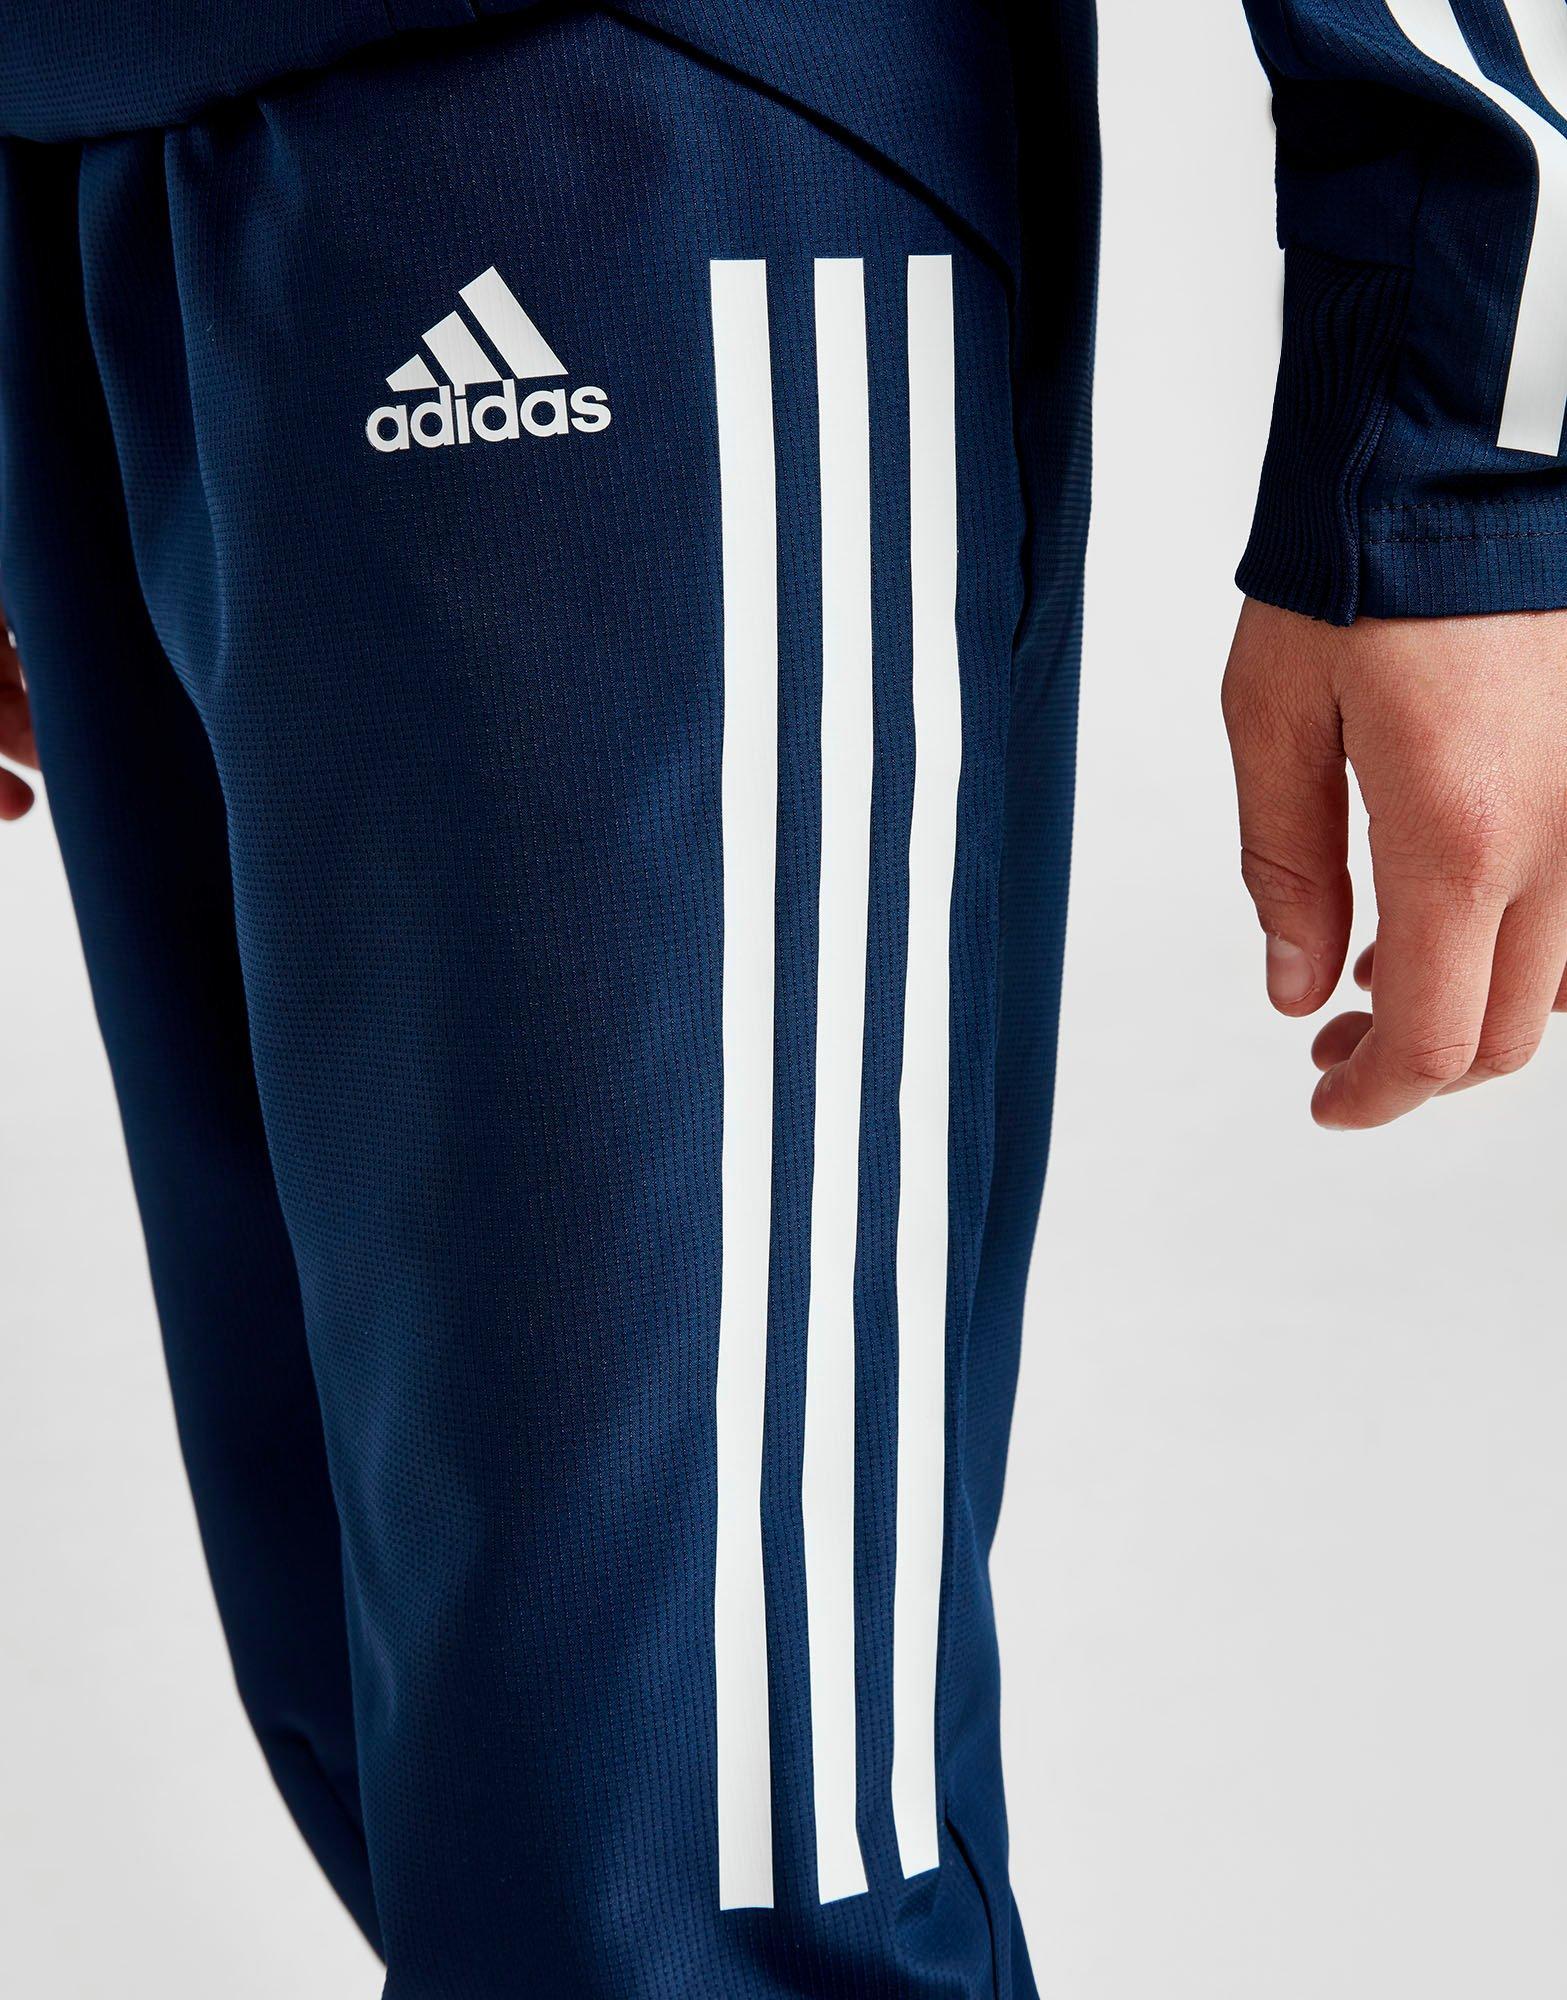 Acherter Bleu adidas Pantalon de Survêtement